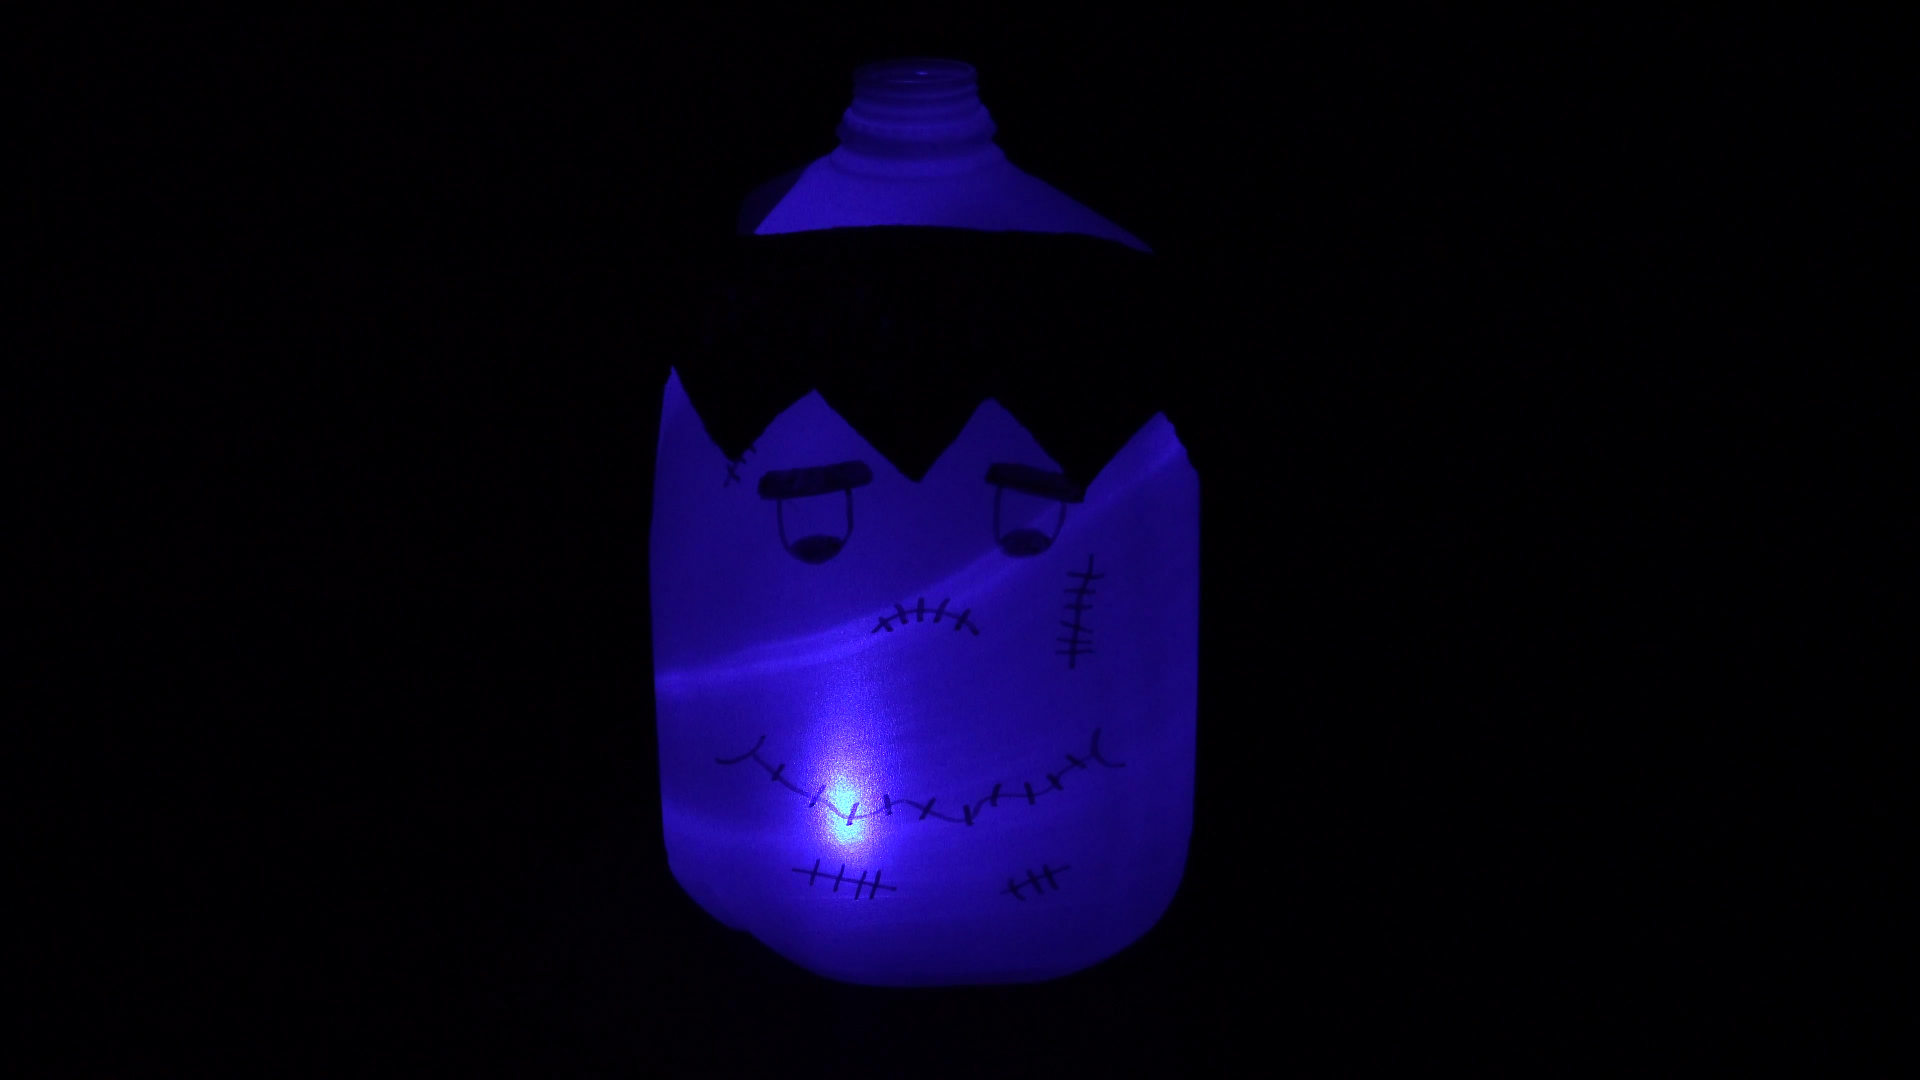 Halloween crafts with color-changing led tea lights - frankenstein